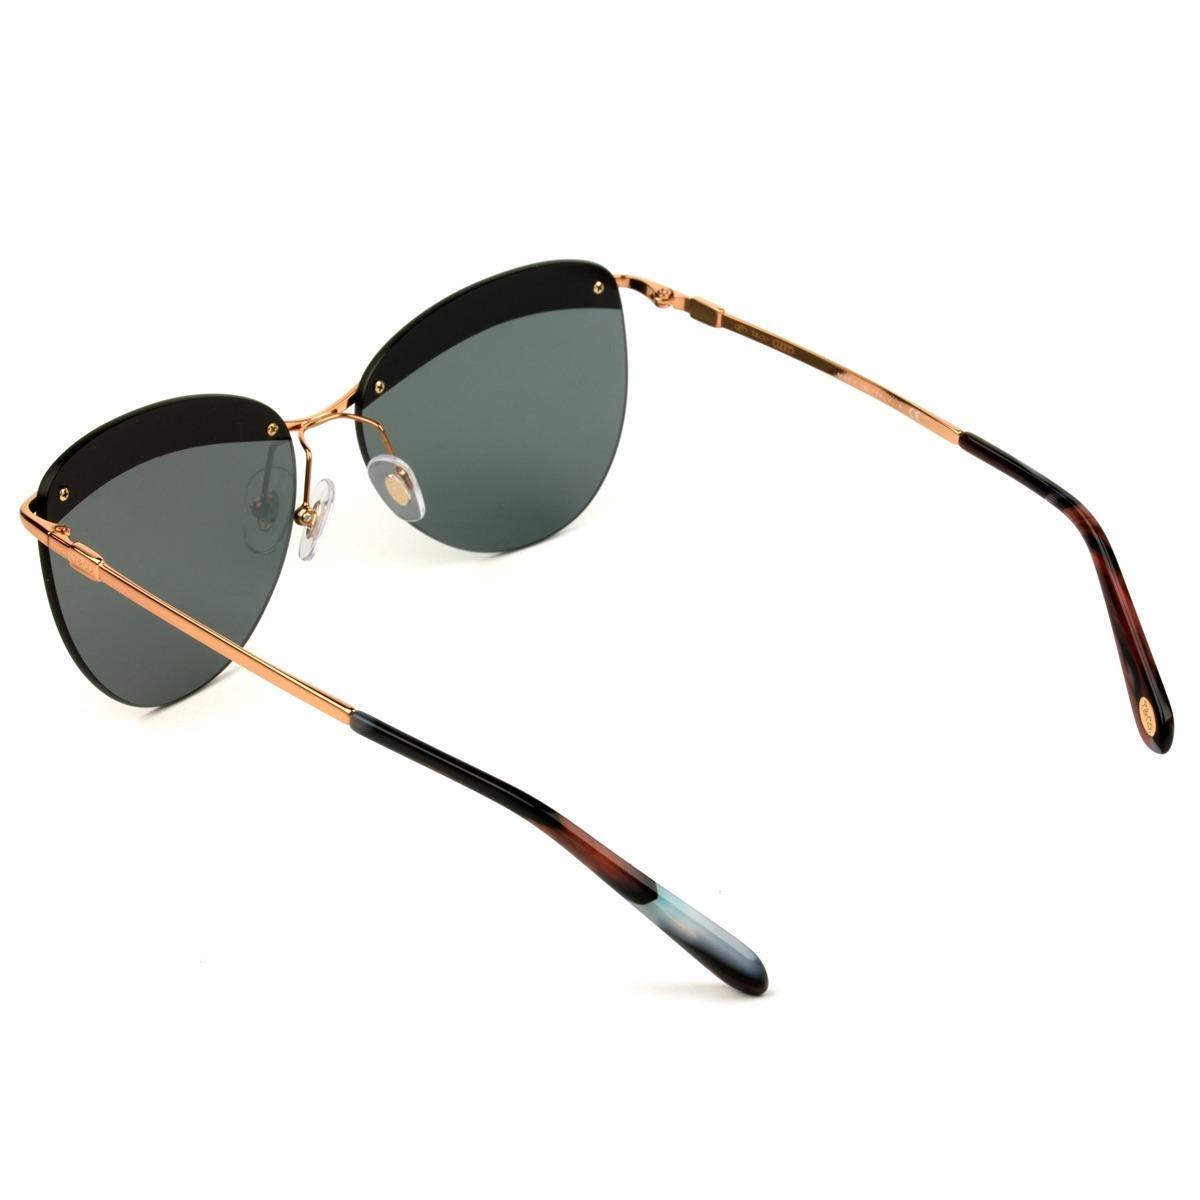 Óculos Tiffany   Co Tf 3057 6105 87 60 - Nota Fiscal - R  1.359,00 ... 68e9ec8047